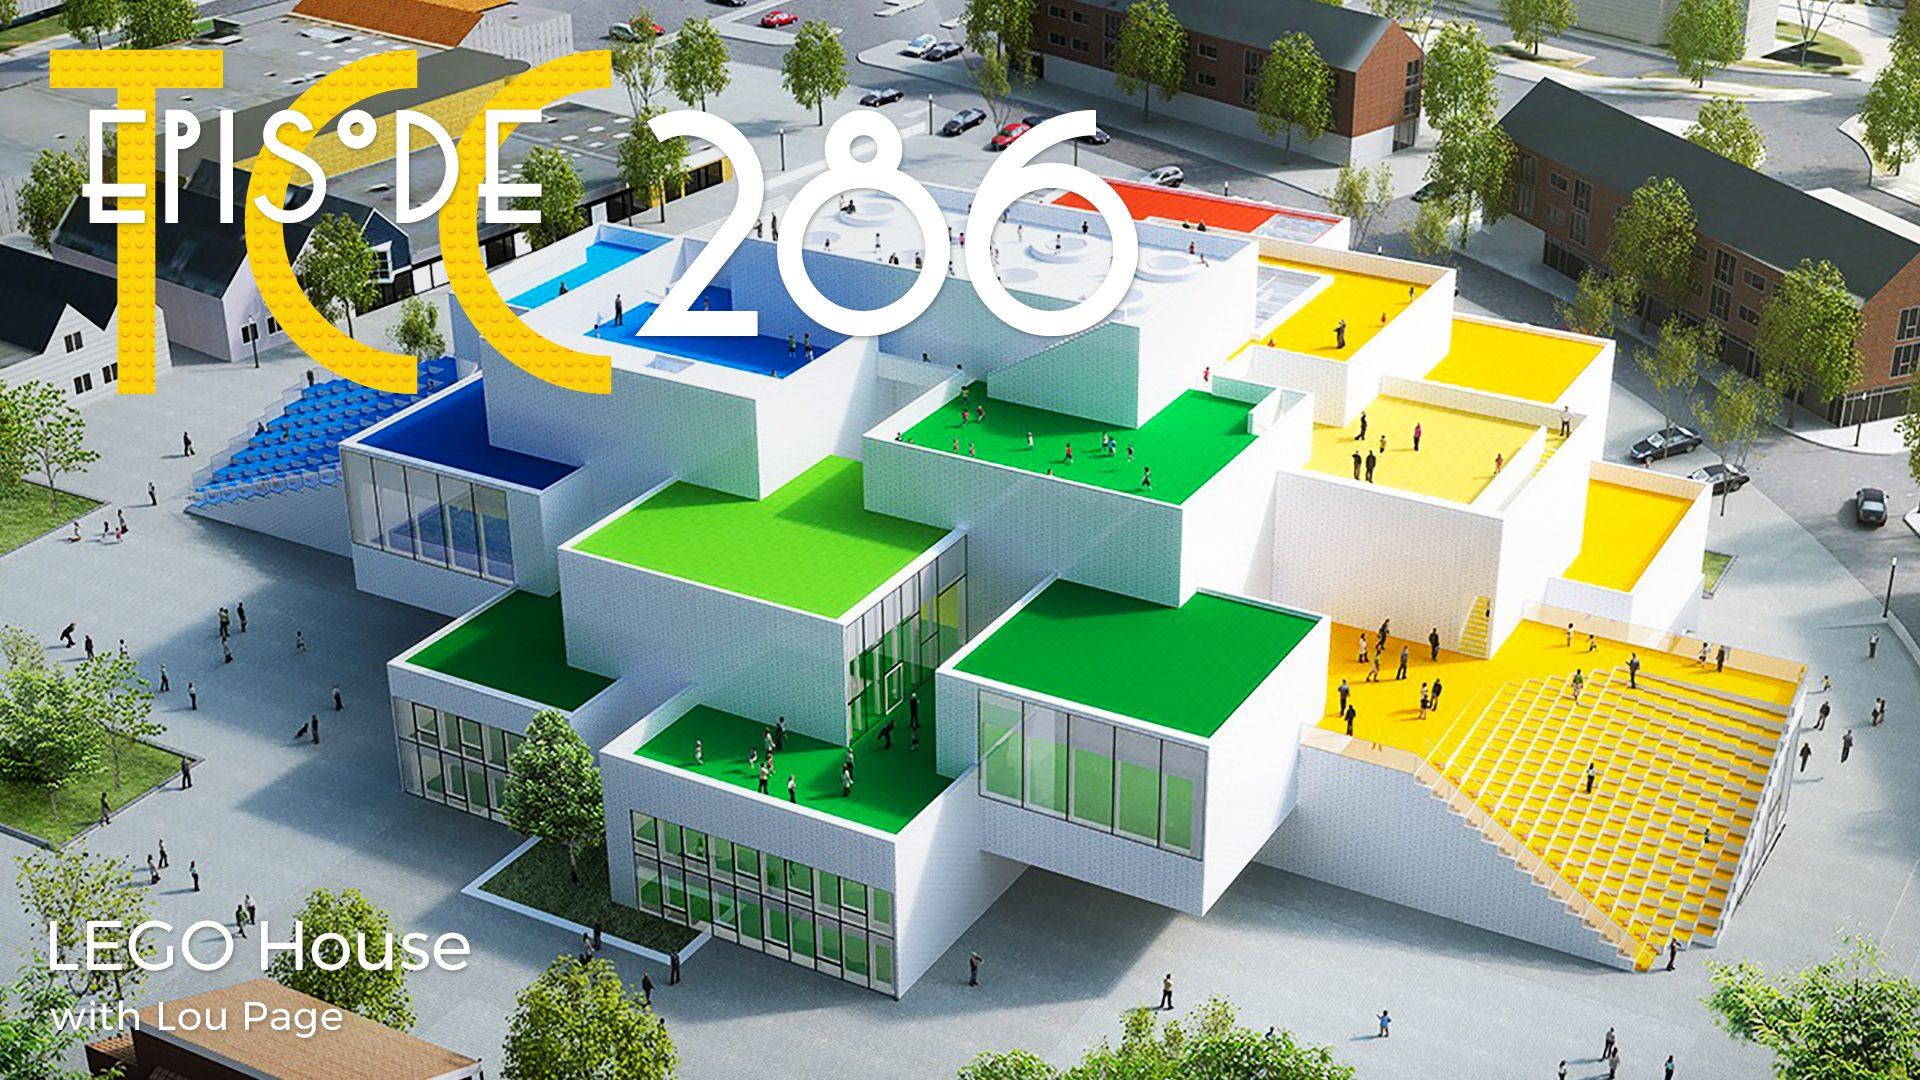 The Citadel Cafe 286: LEGO House